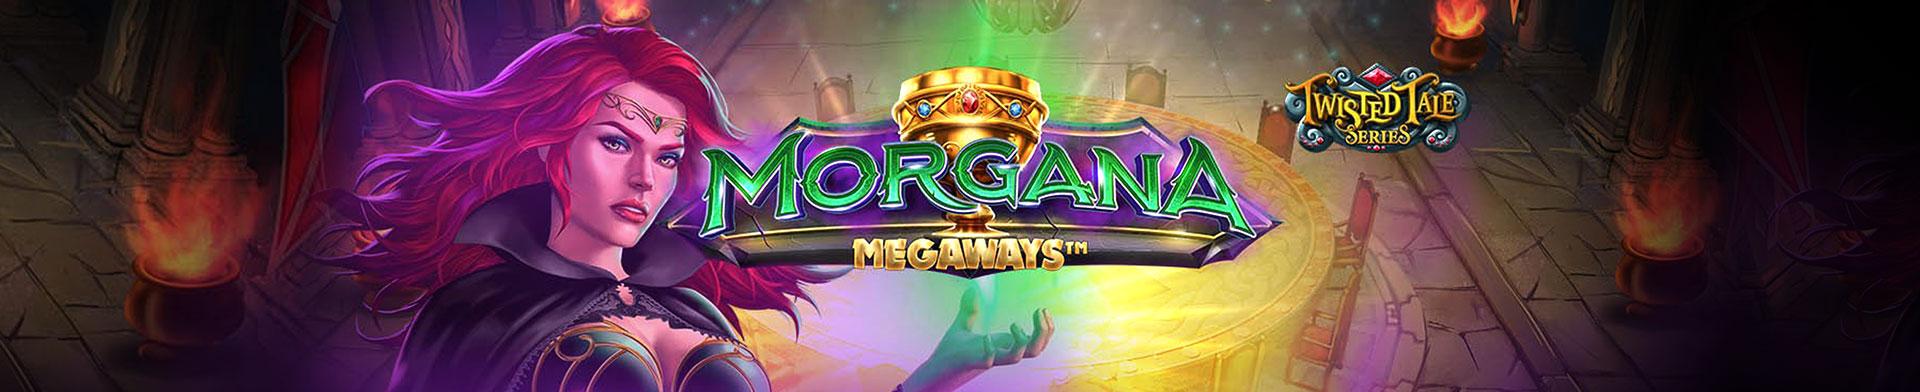 Morgana Megaways Banners